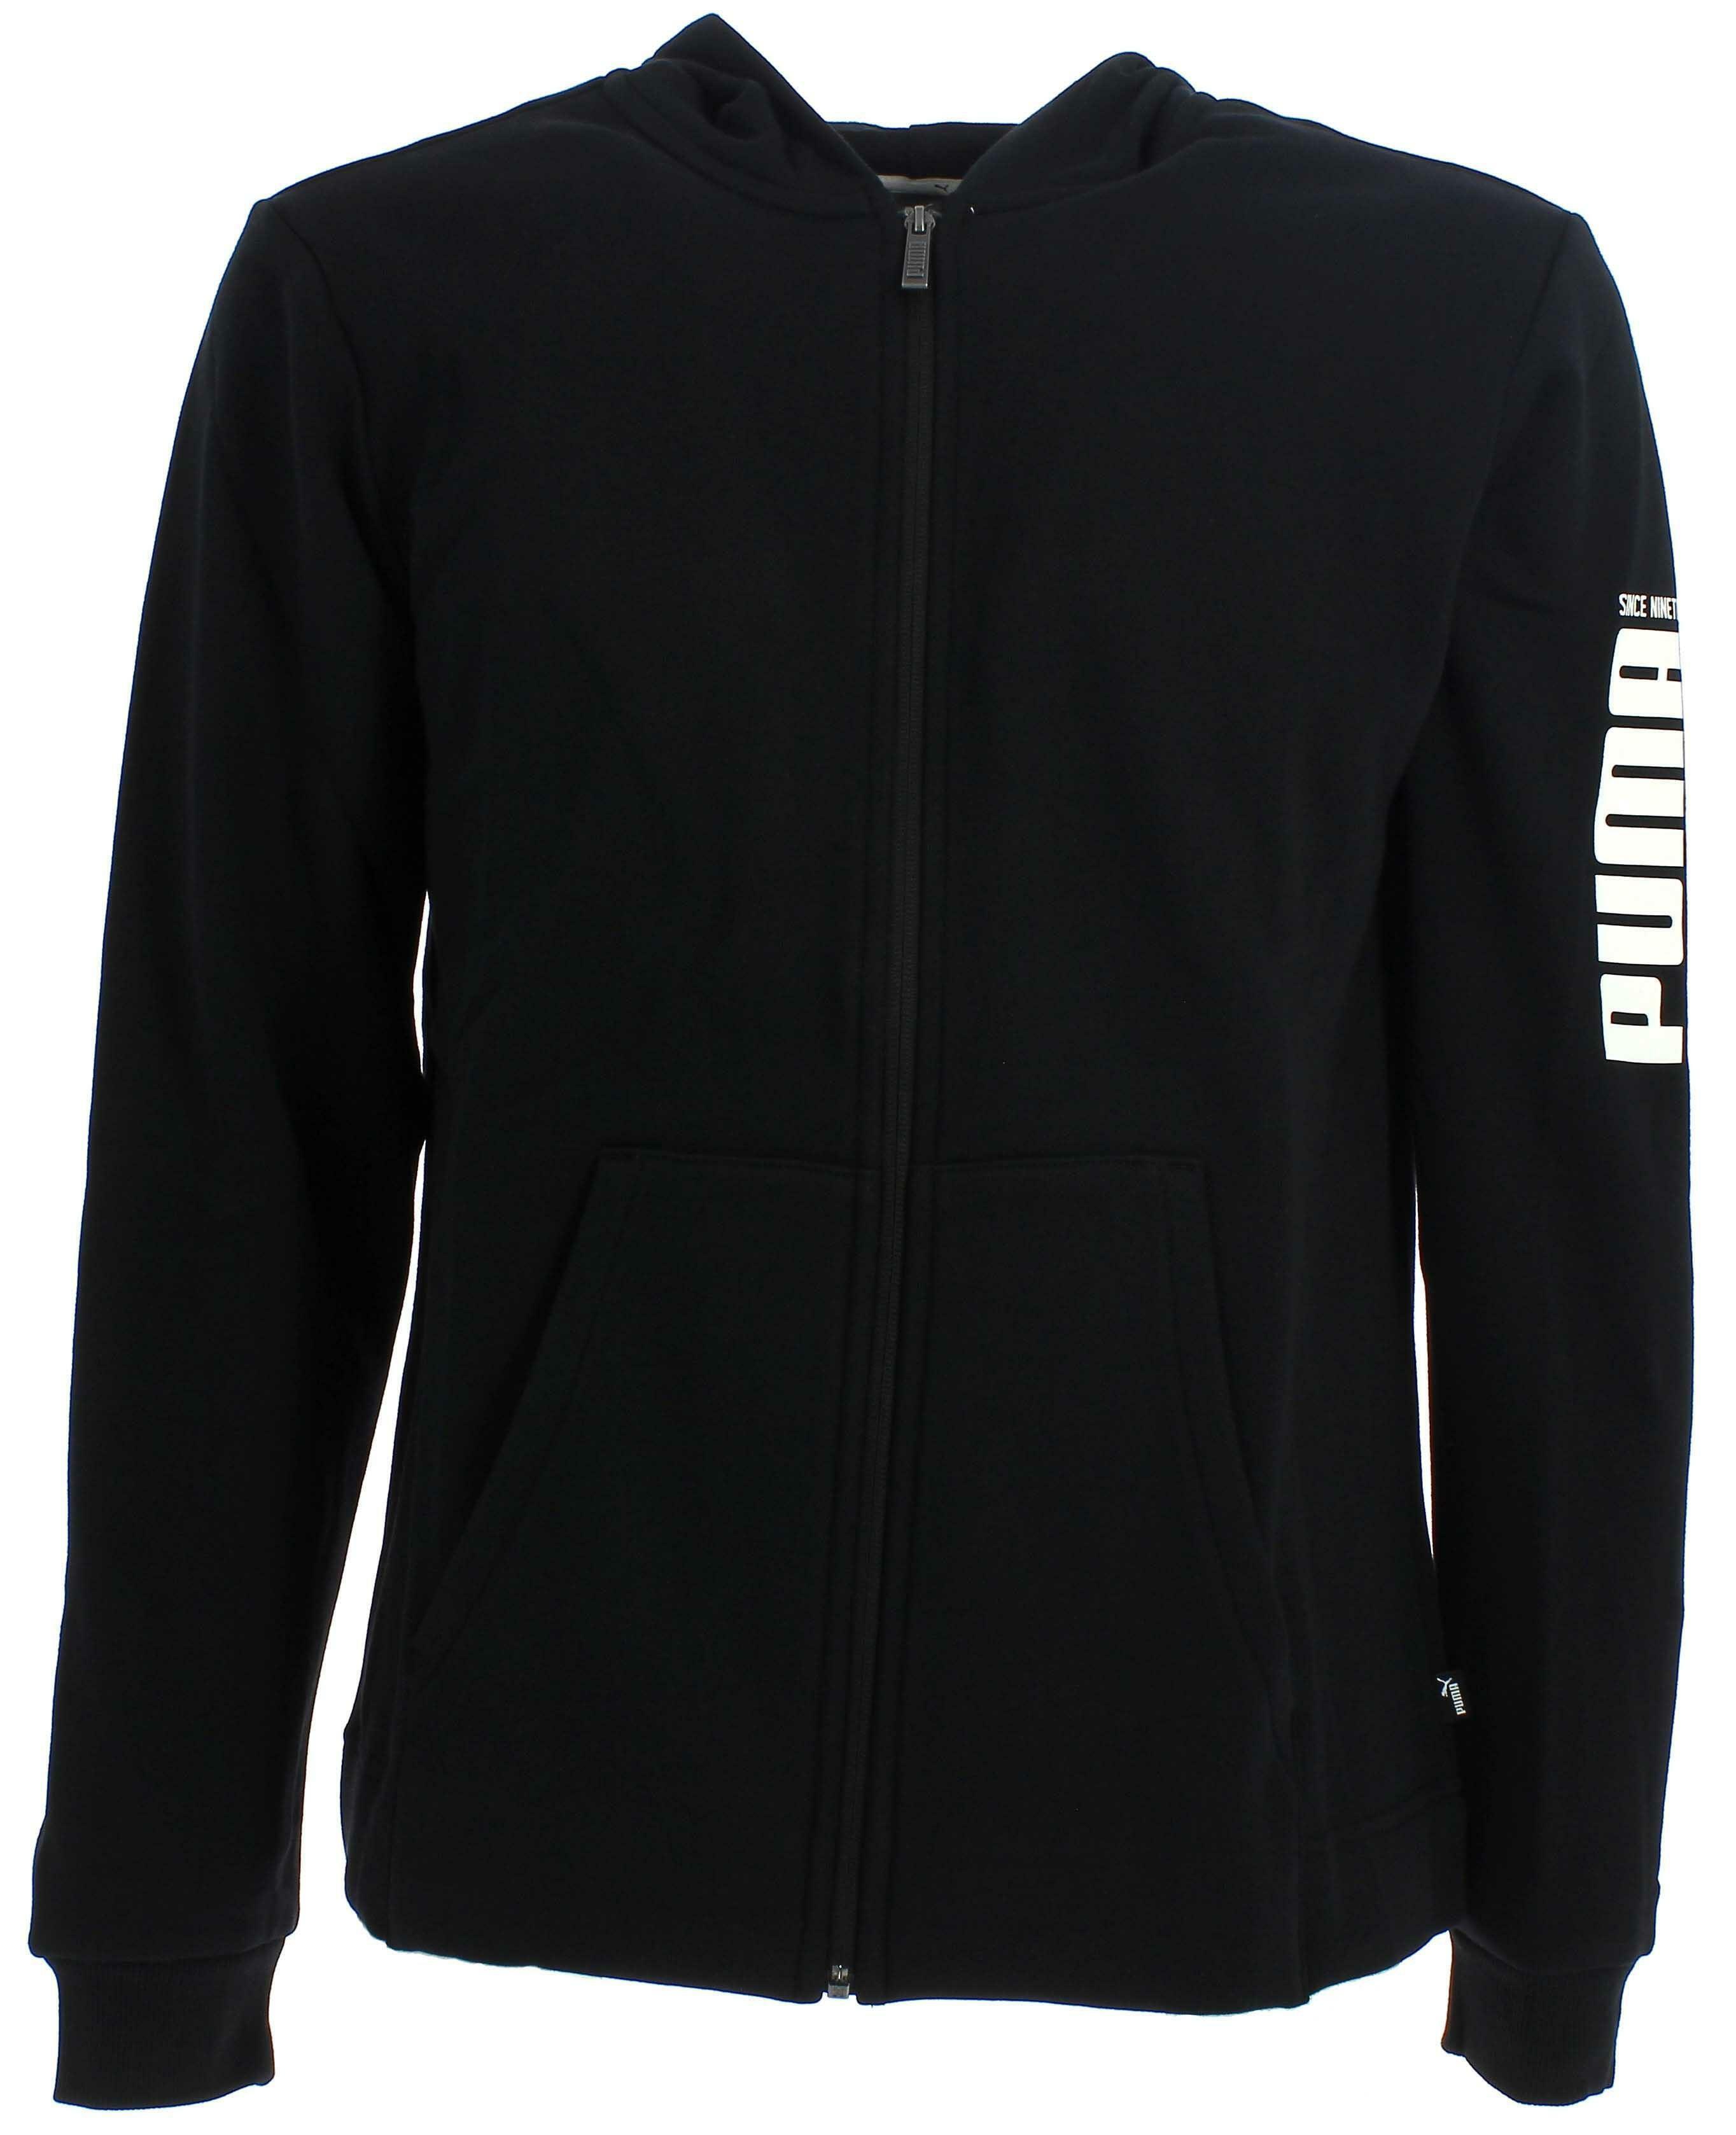 buy popular 6b956 ec312 Puma giacchetto bambino nero felpato 85243701